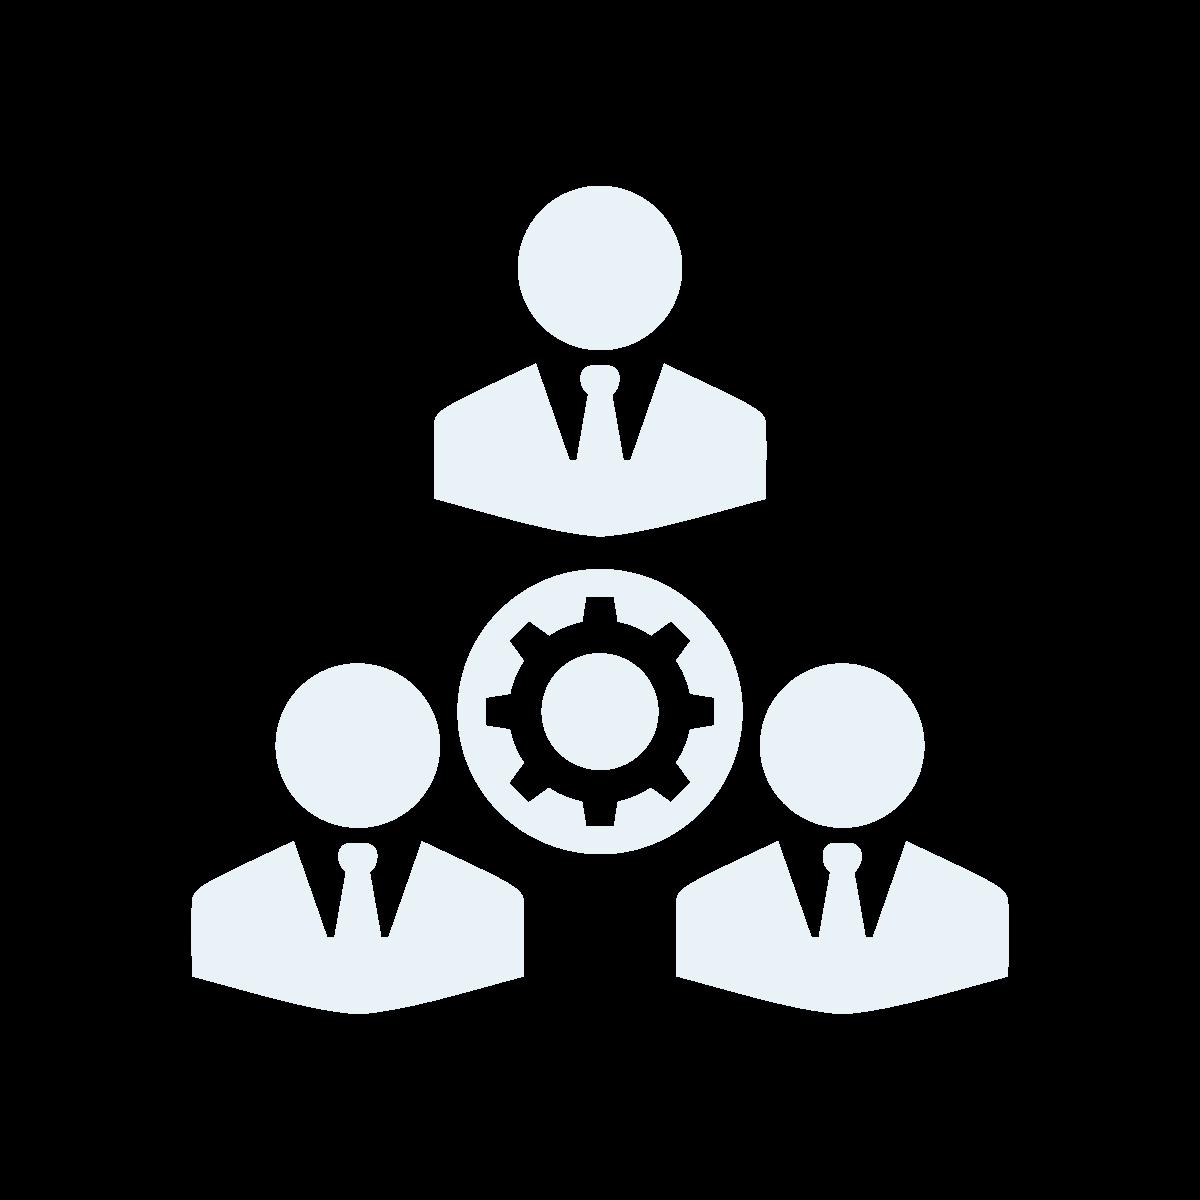 noun_organization_2481704(2)